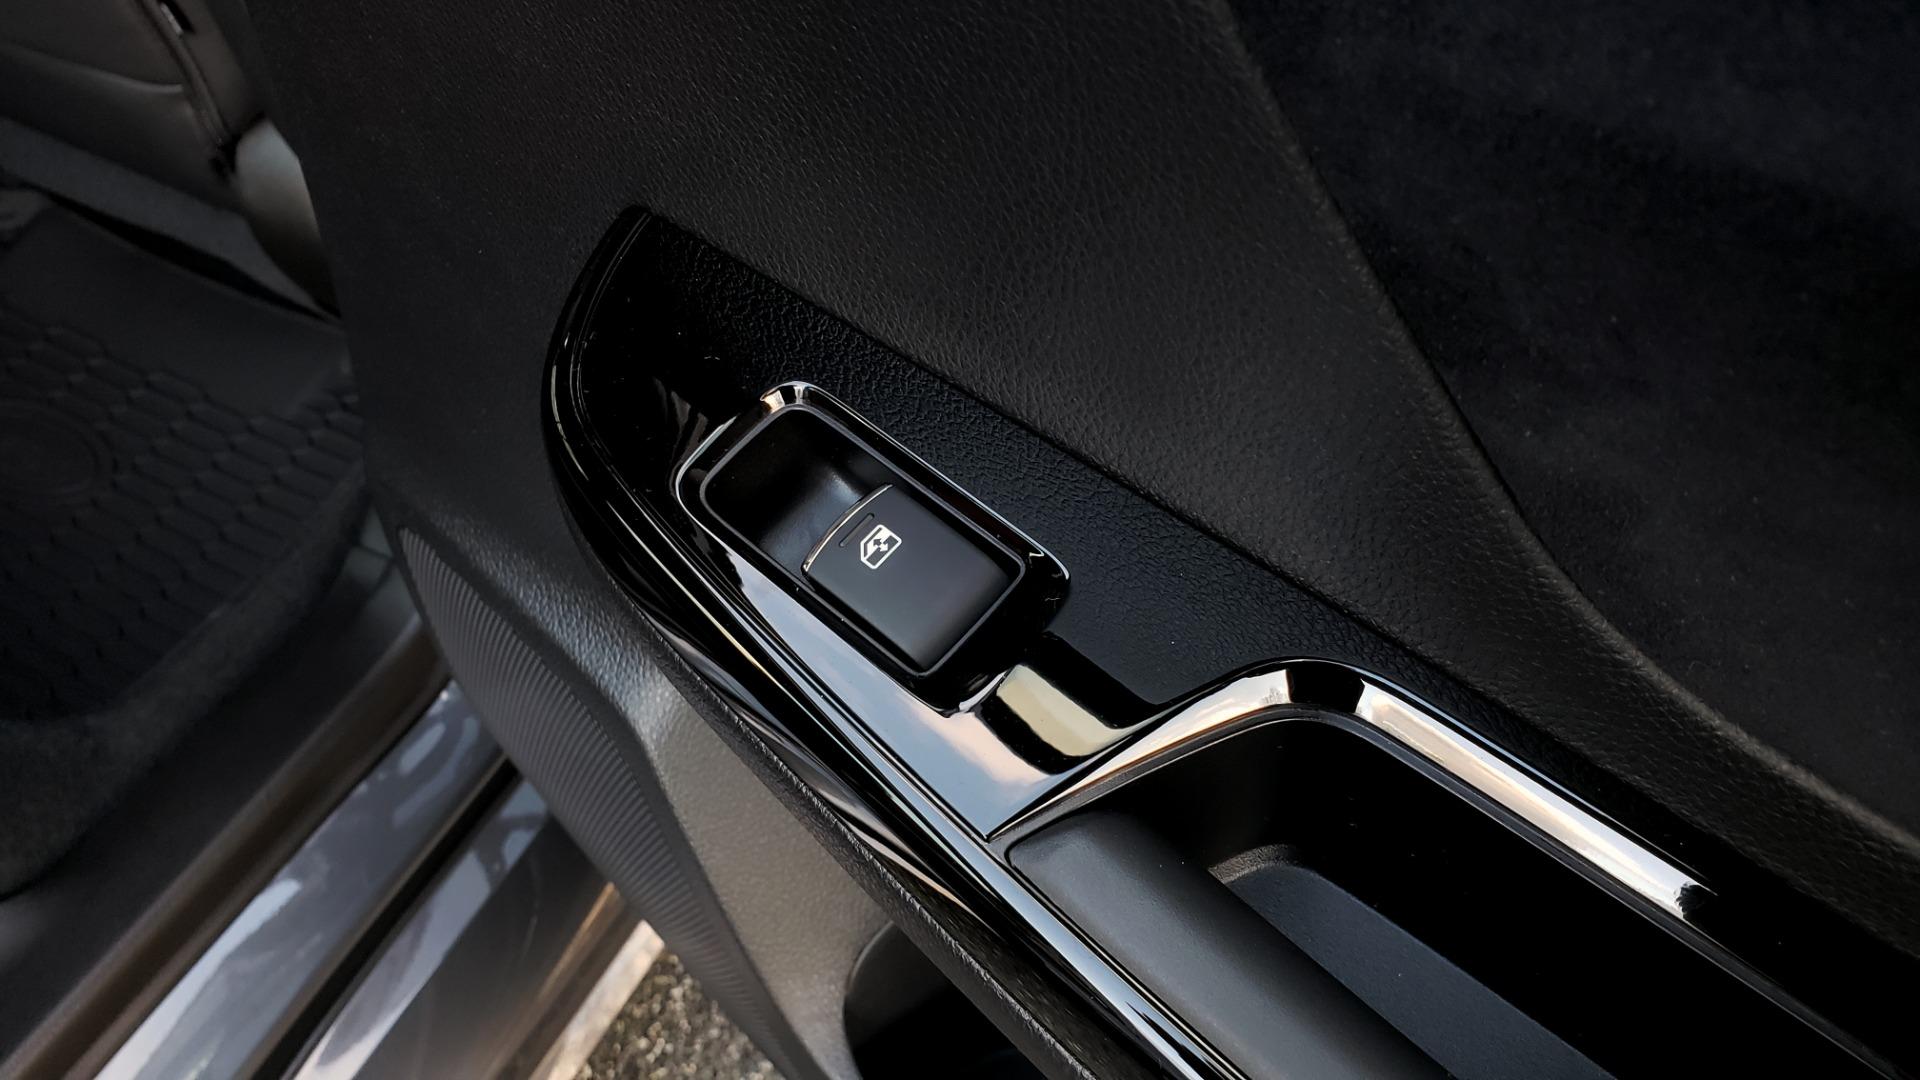 Used 2020 Subaru WRX STI 2.5L TURBO / 6-SPEED MANUAL / RECARO SEATS / REARVIEW for sale Sold at Formula Imports in Charlotte NC 28227 81